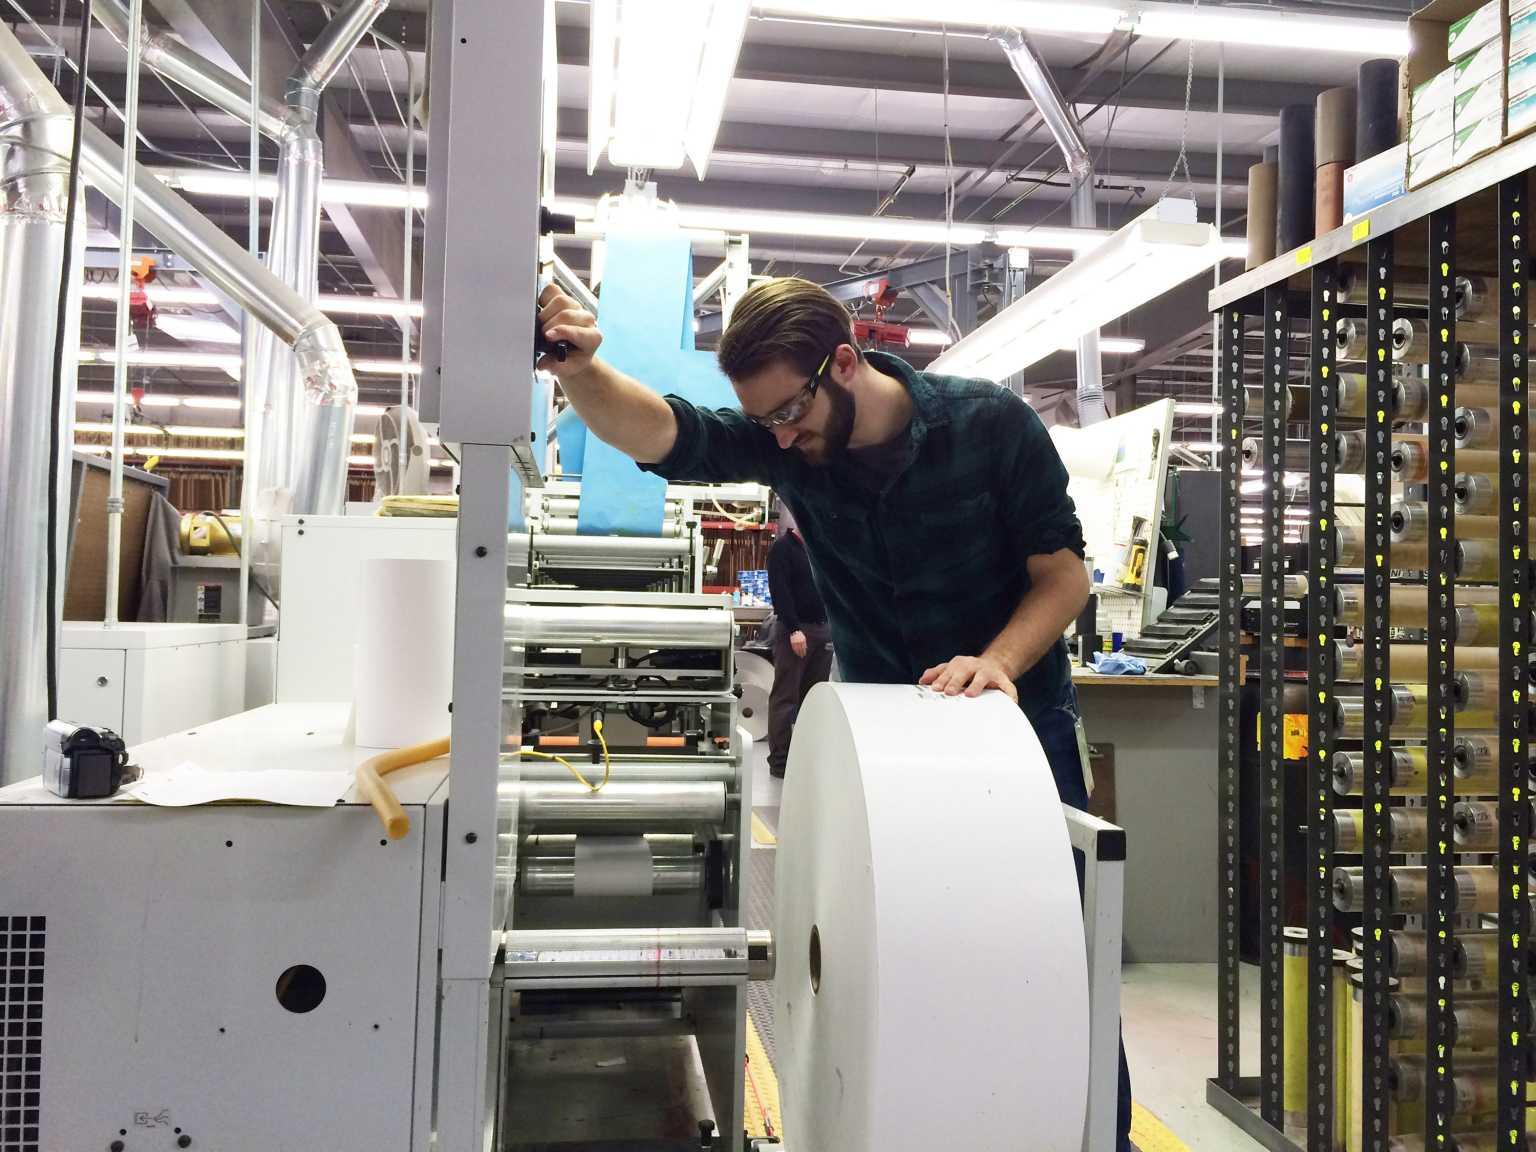 GCM student loading flexography press